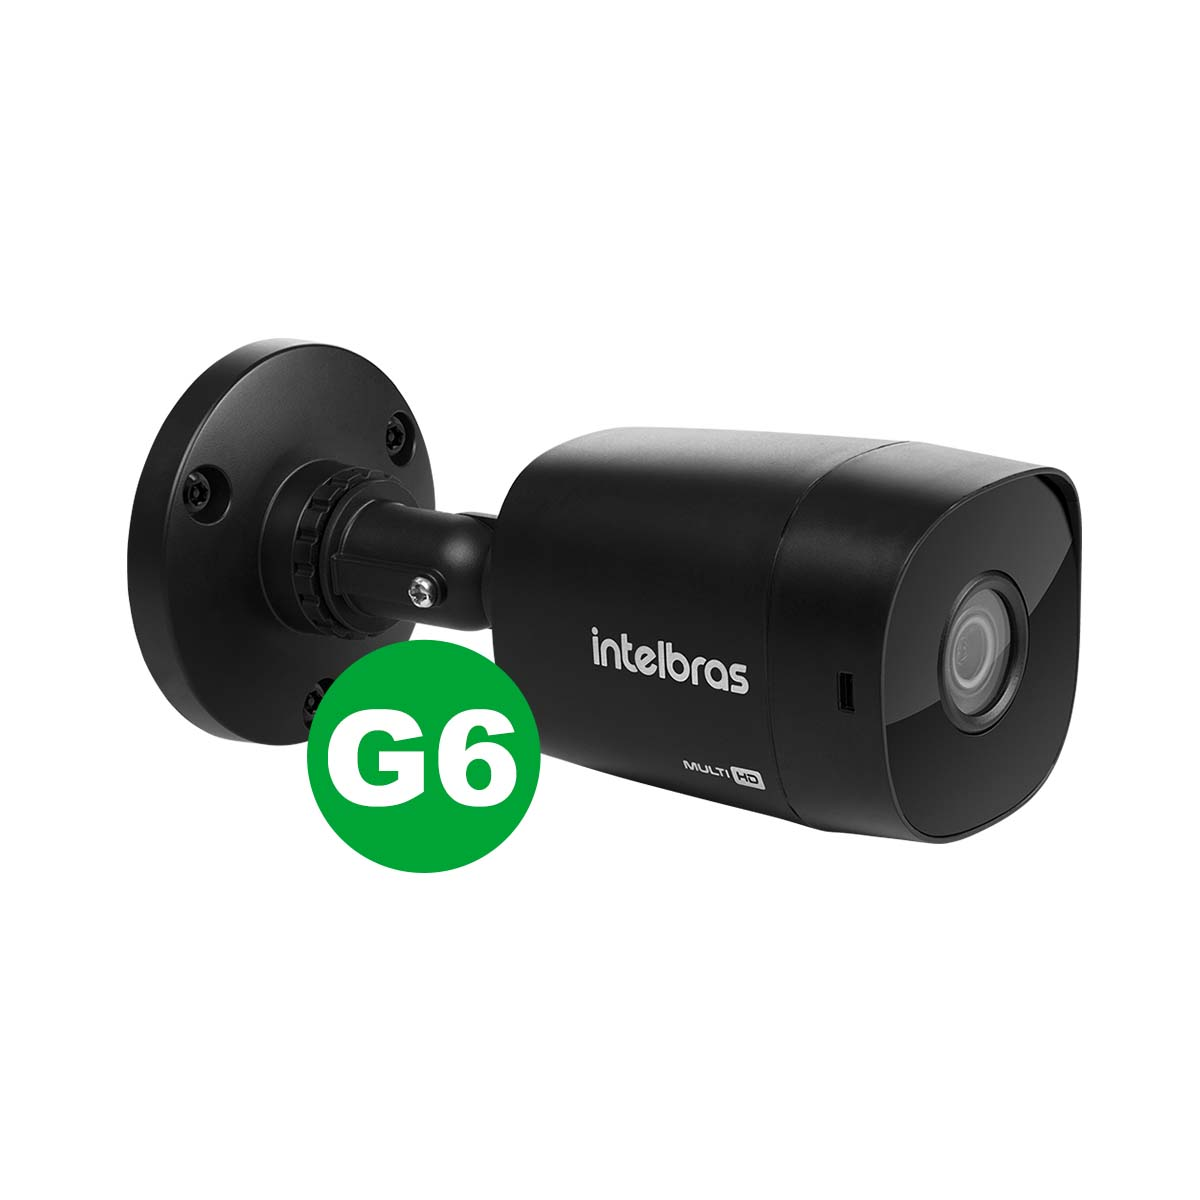 Kit Câmera Intelbras Vhd 1220 Black G6 3,6mm + Acessórios